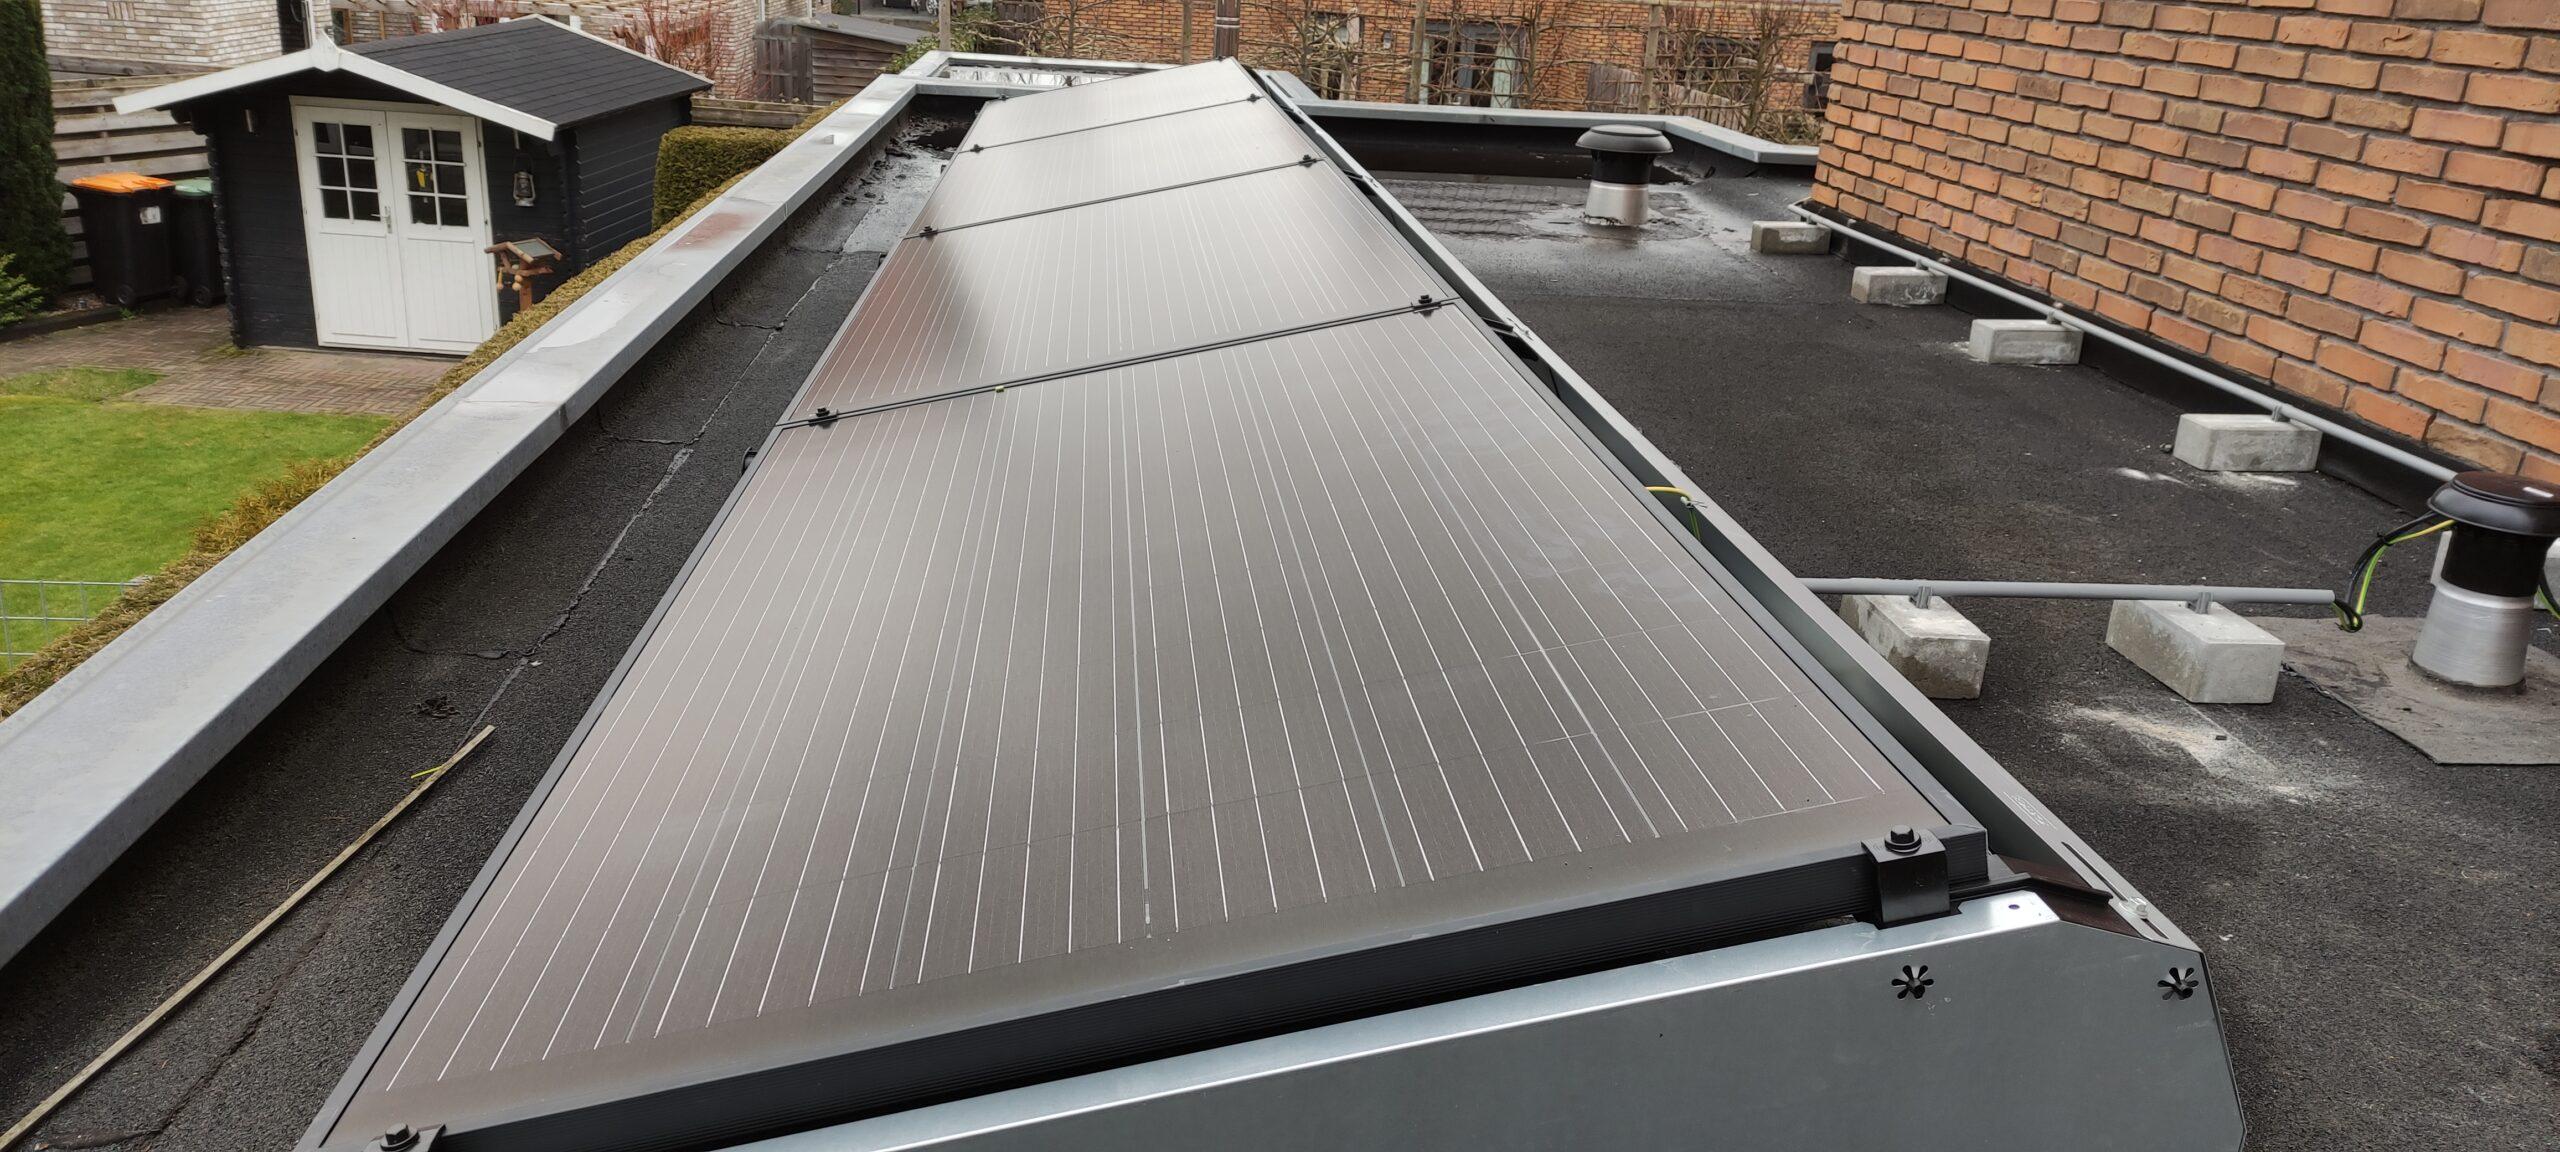 SolarWatt black edition glas glas zonnepanelen Zuidwolde